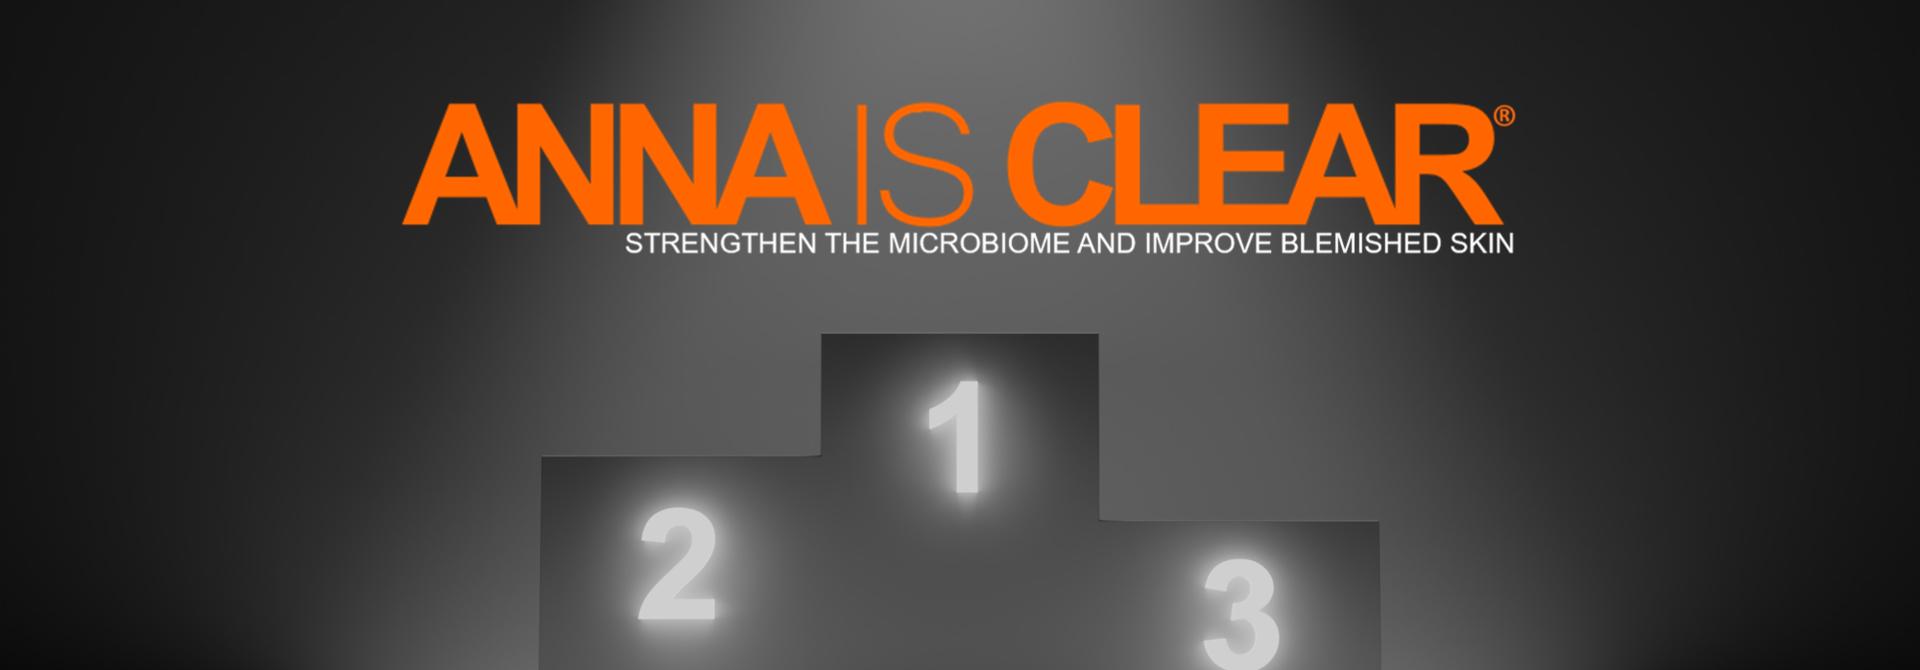 De microbioom en ß glucans